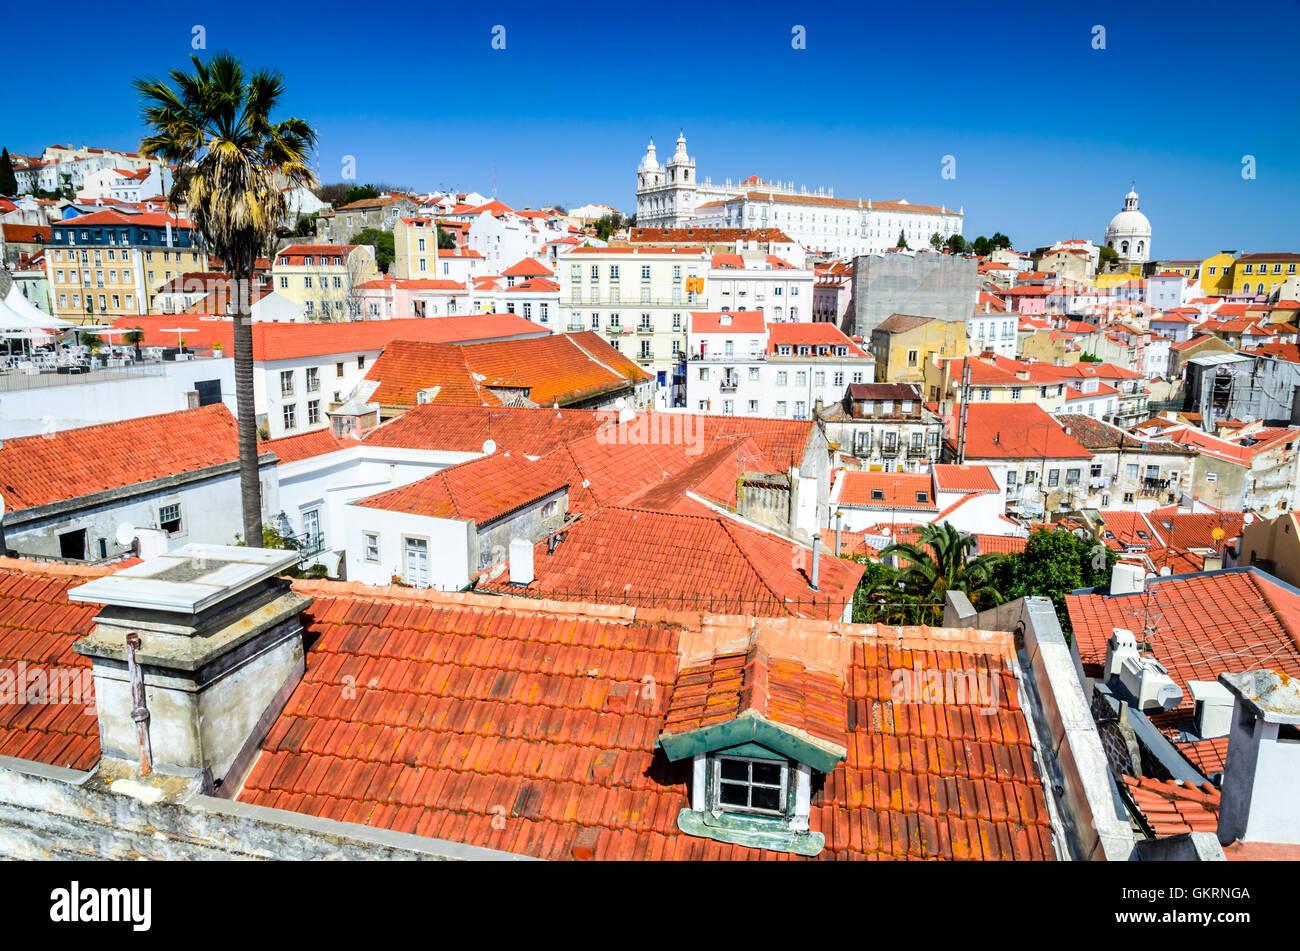 Lisbon, Portugal. Cityscape with traditional architecture, Alfama district, Lisboa, portuguese capital. - Stock Image